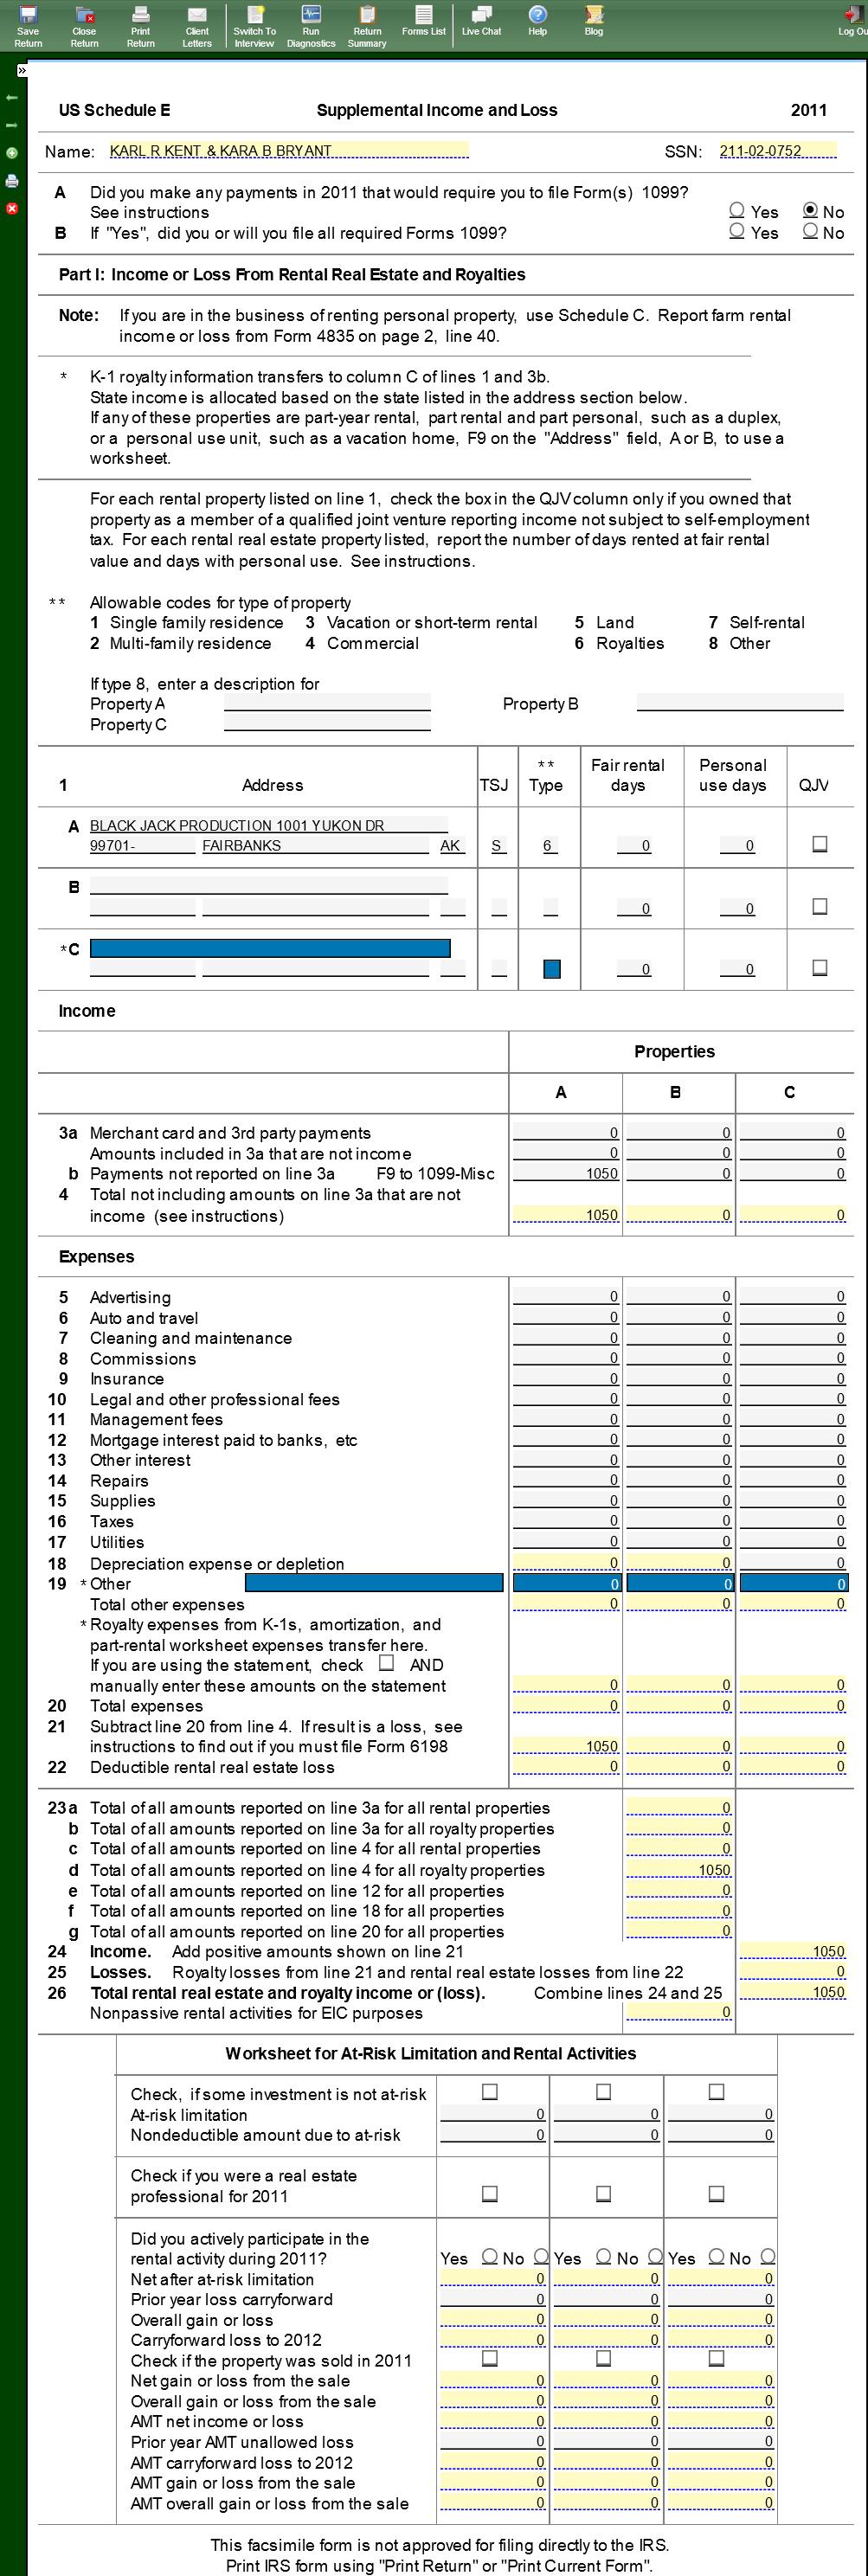 LAW-L1 Kent Refund Monitor